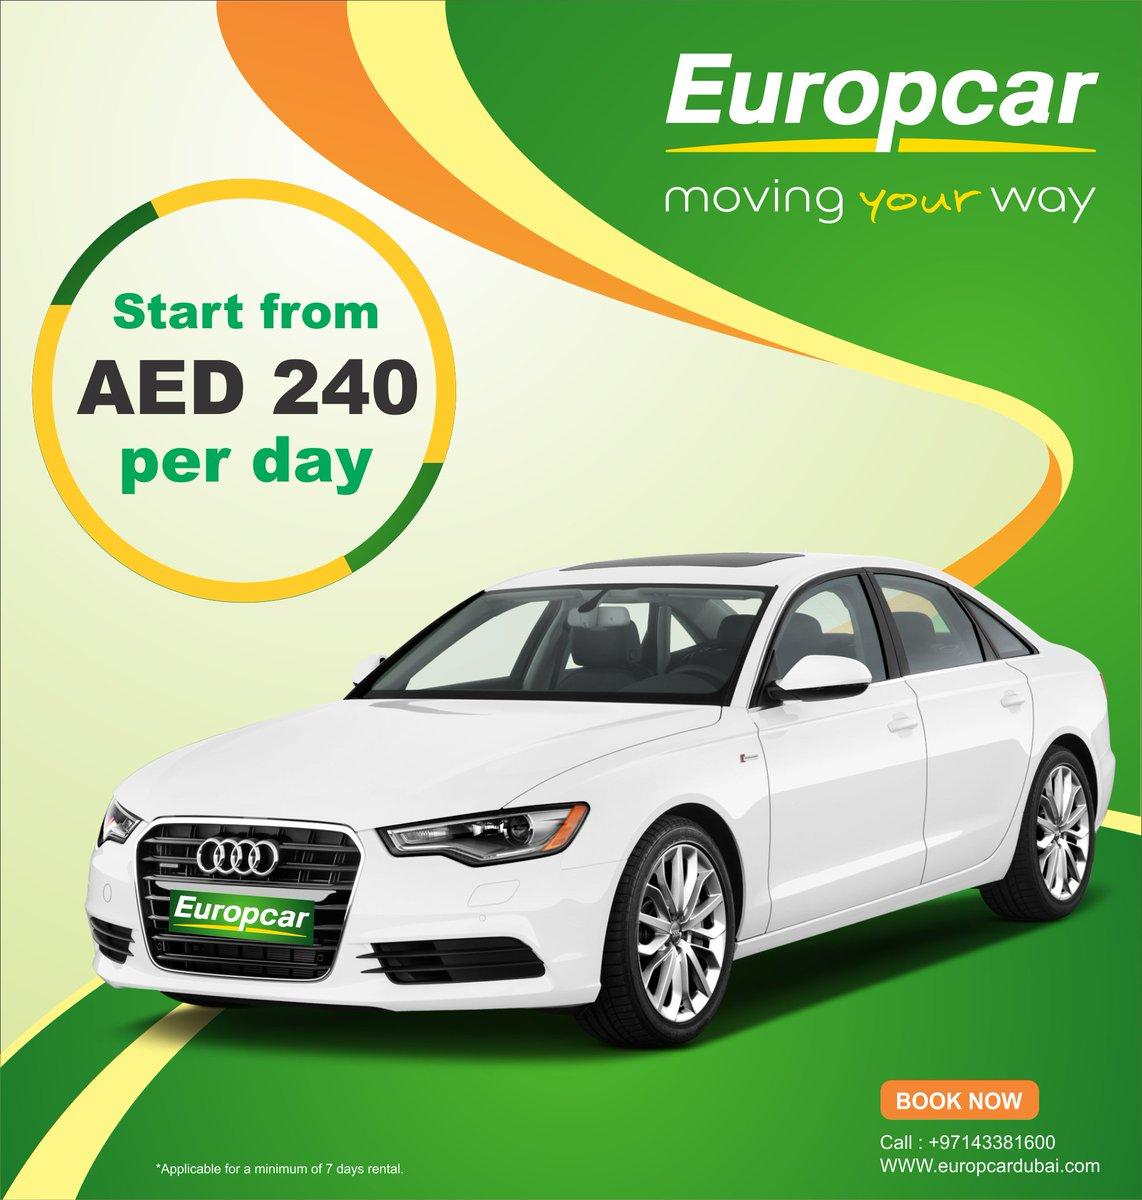 Europcar Dubai On Twitter Europcar Dubai Audi Car Rental Starts